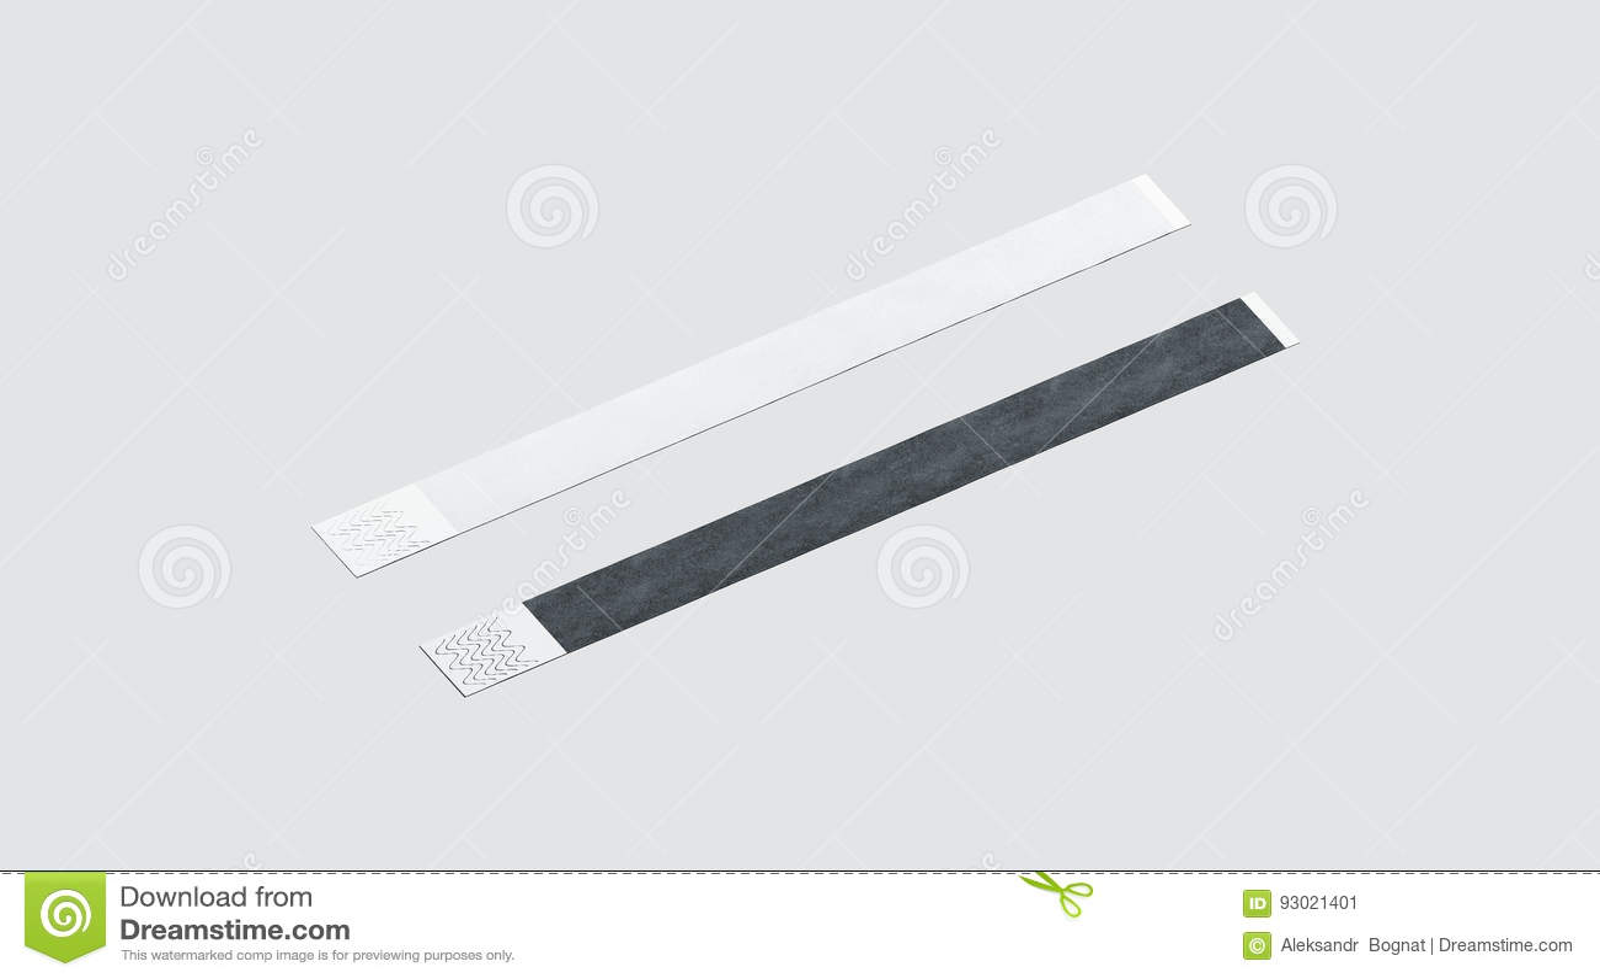 blank black and white paper wristband mockup stock image image of mockup care 93021401. Black Bedroom Furniture Sets. Home Design Ideas